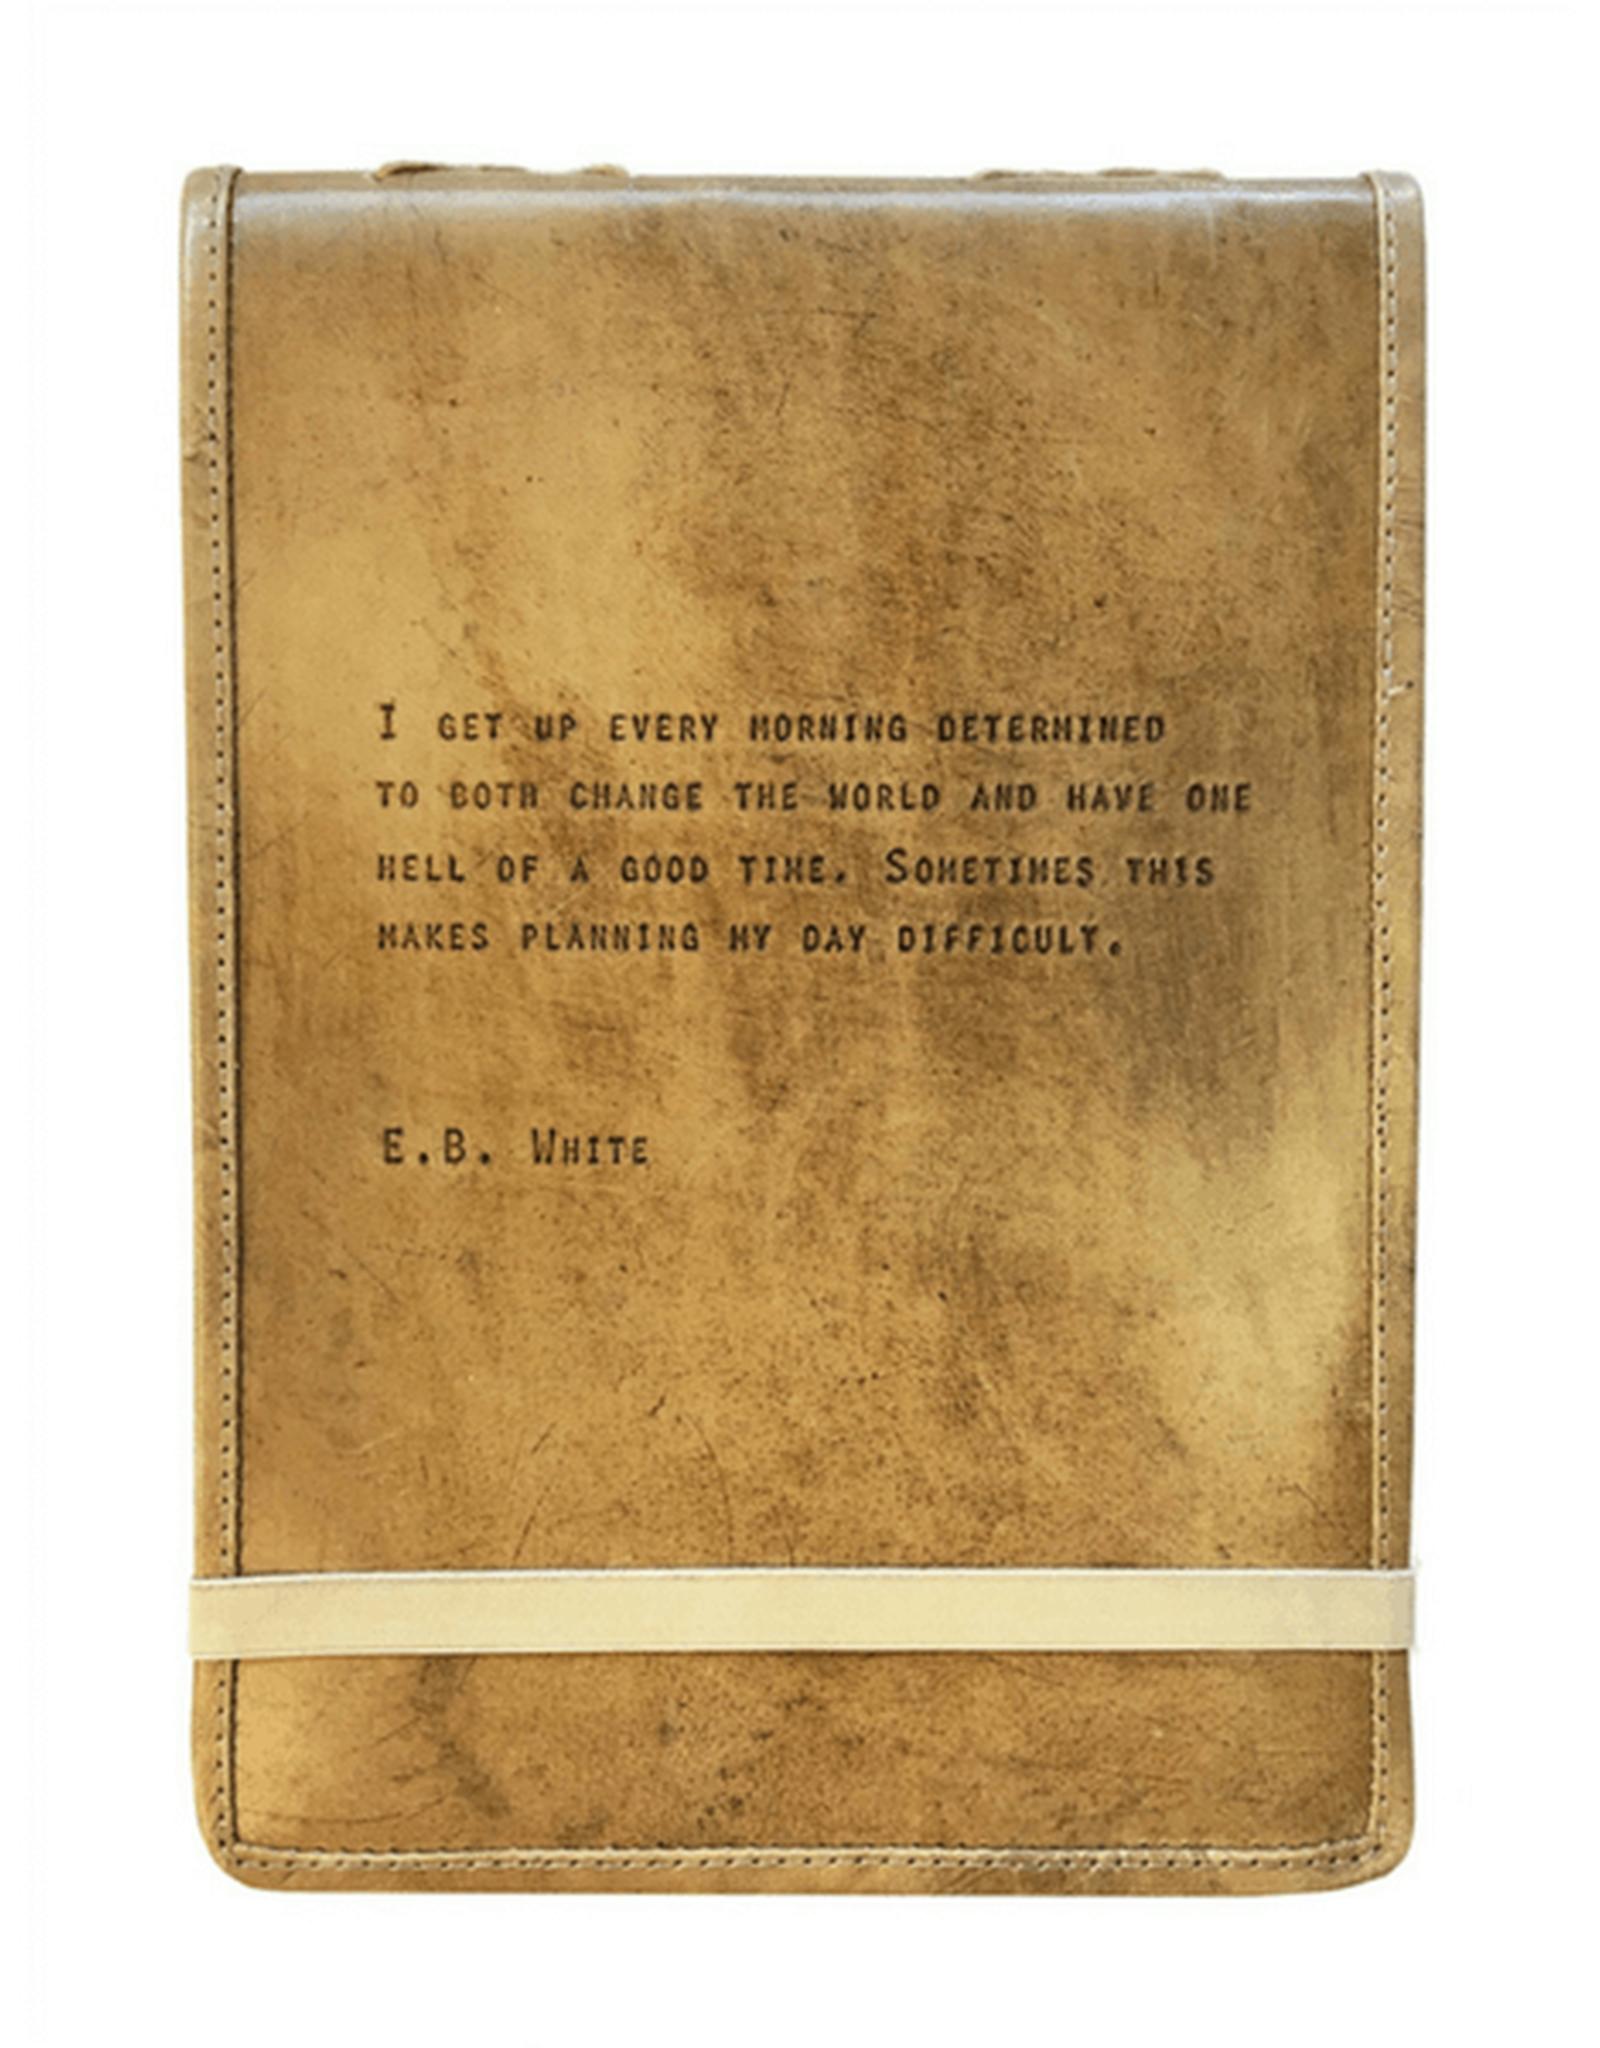 SB-Co E.B. White Leather Journal